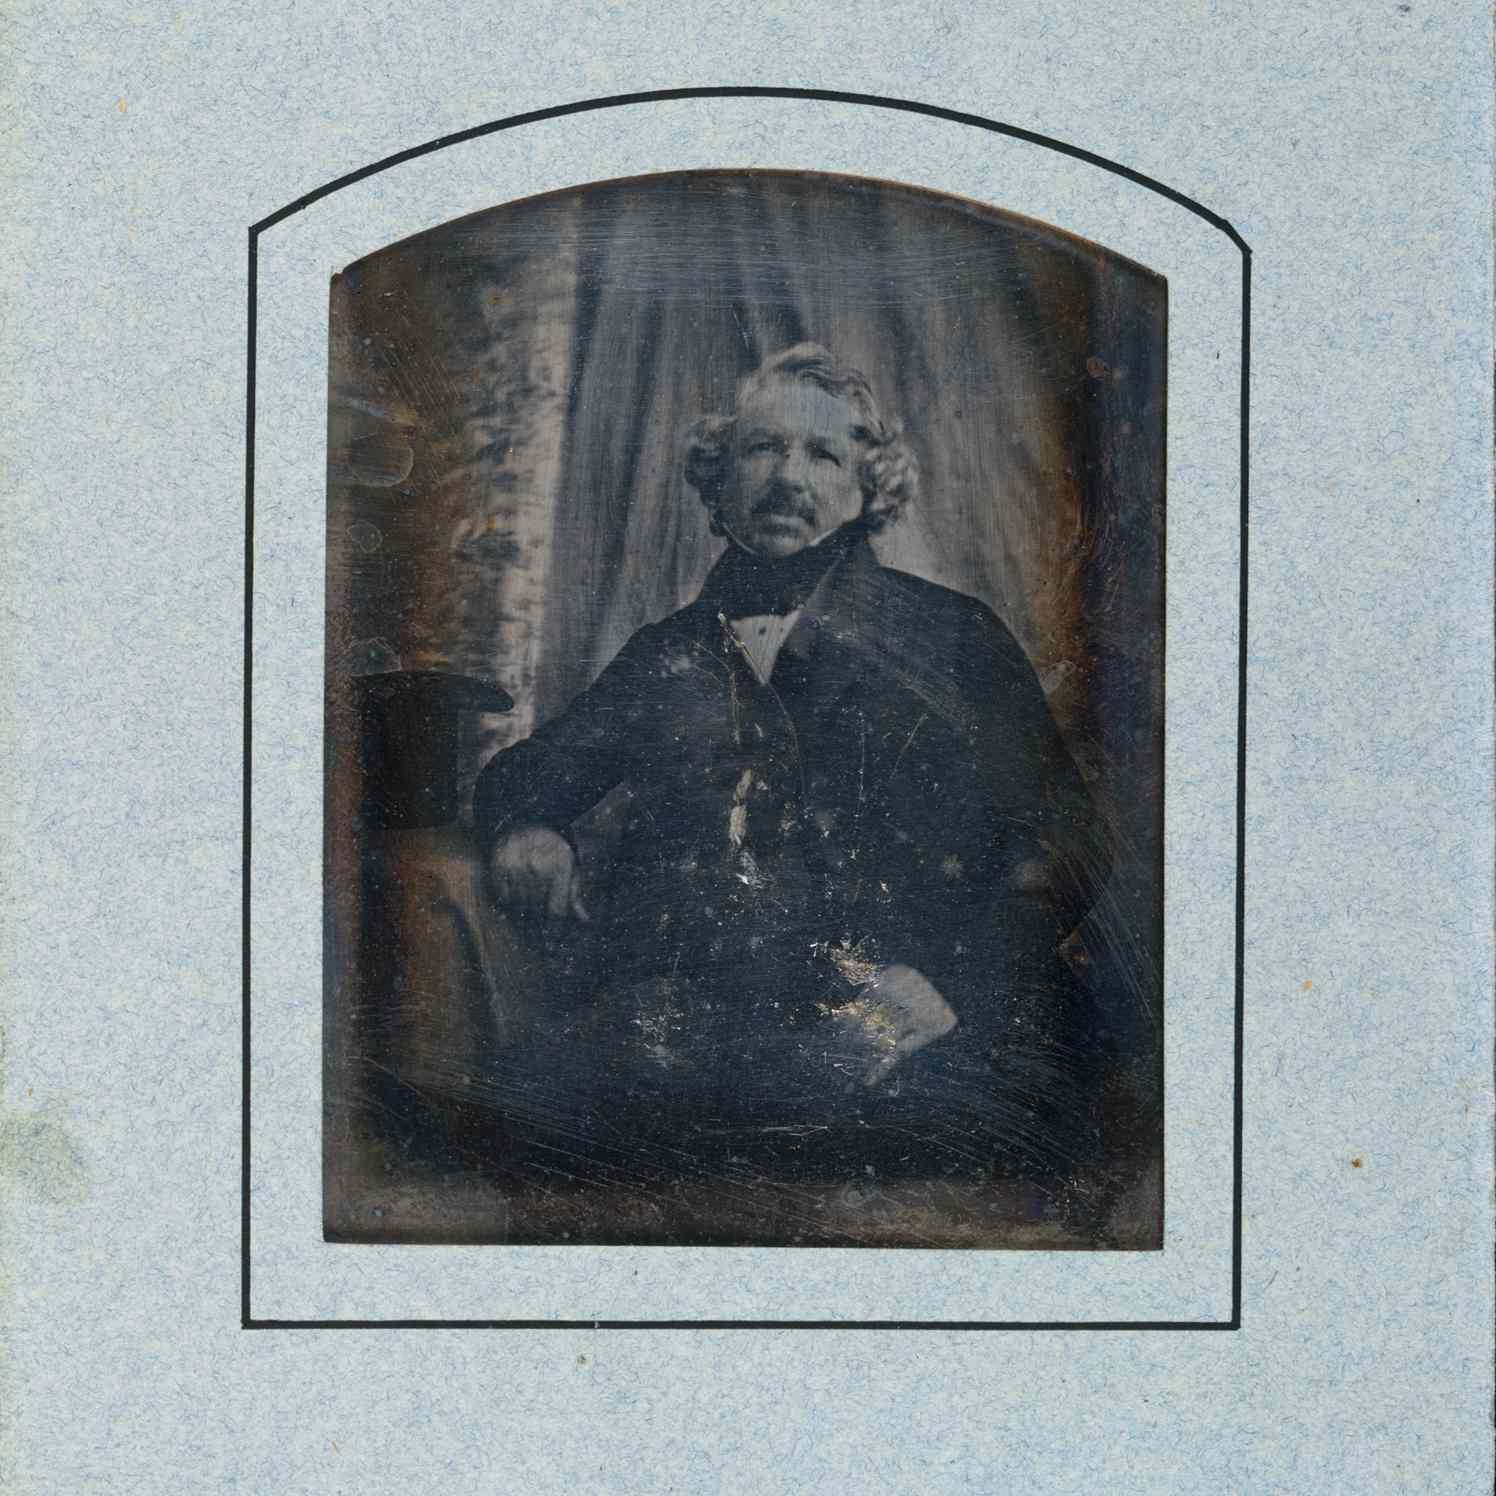 daguerreotype portrait of Louis Daguerre circa 1844